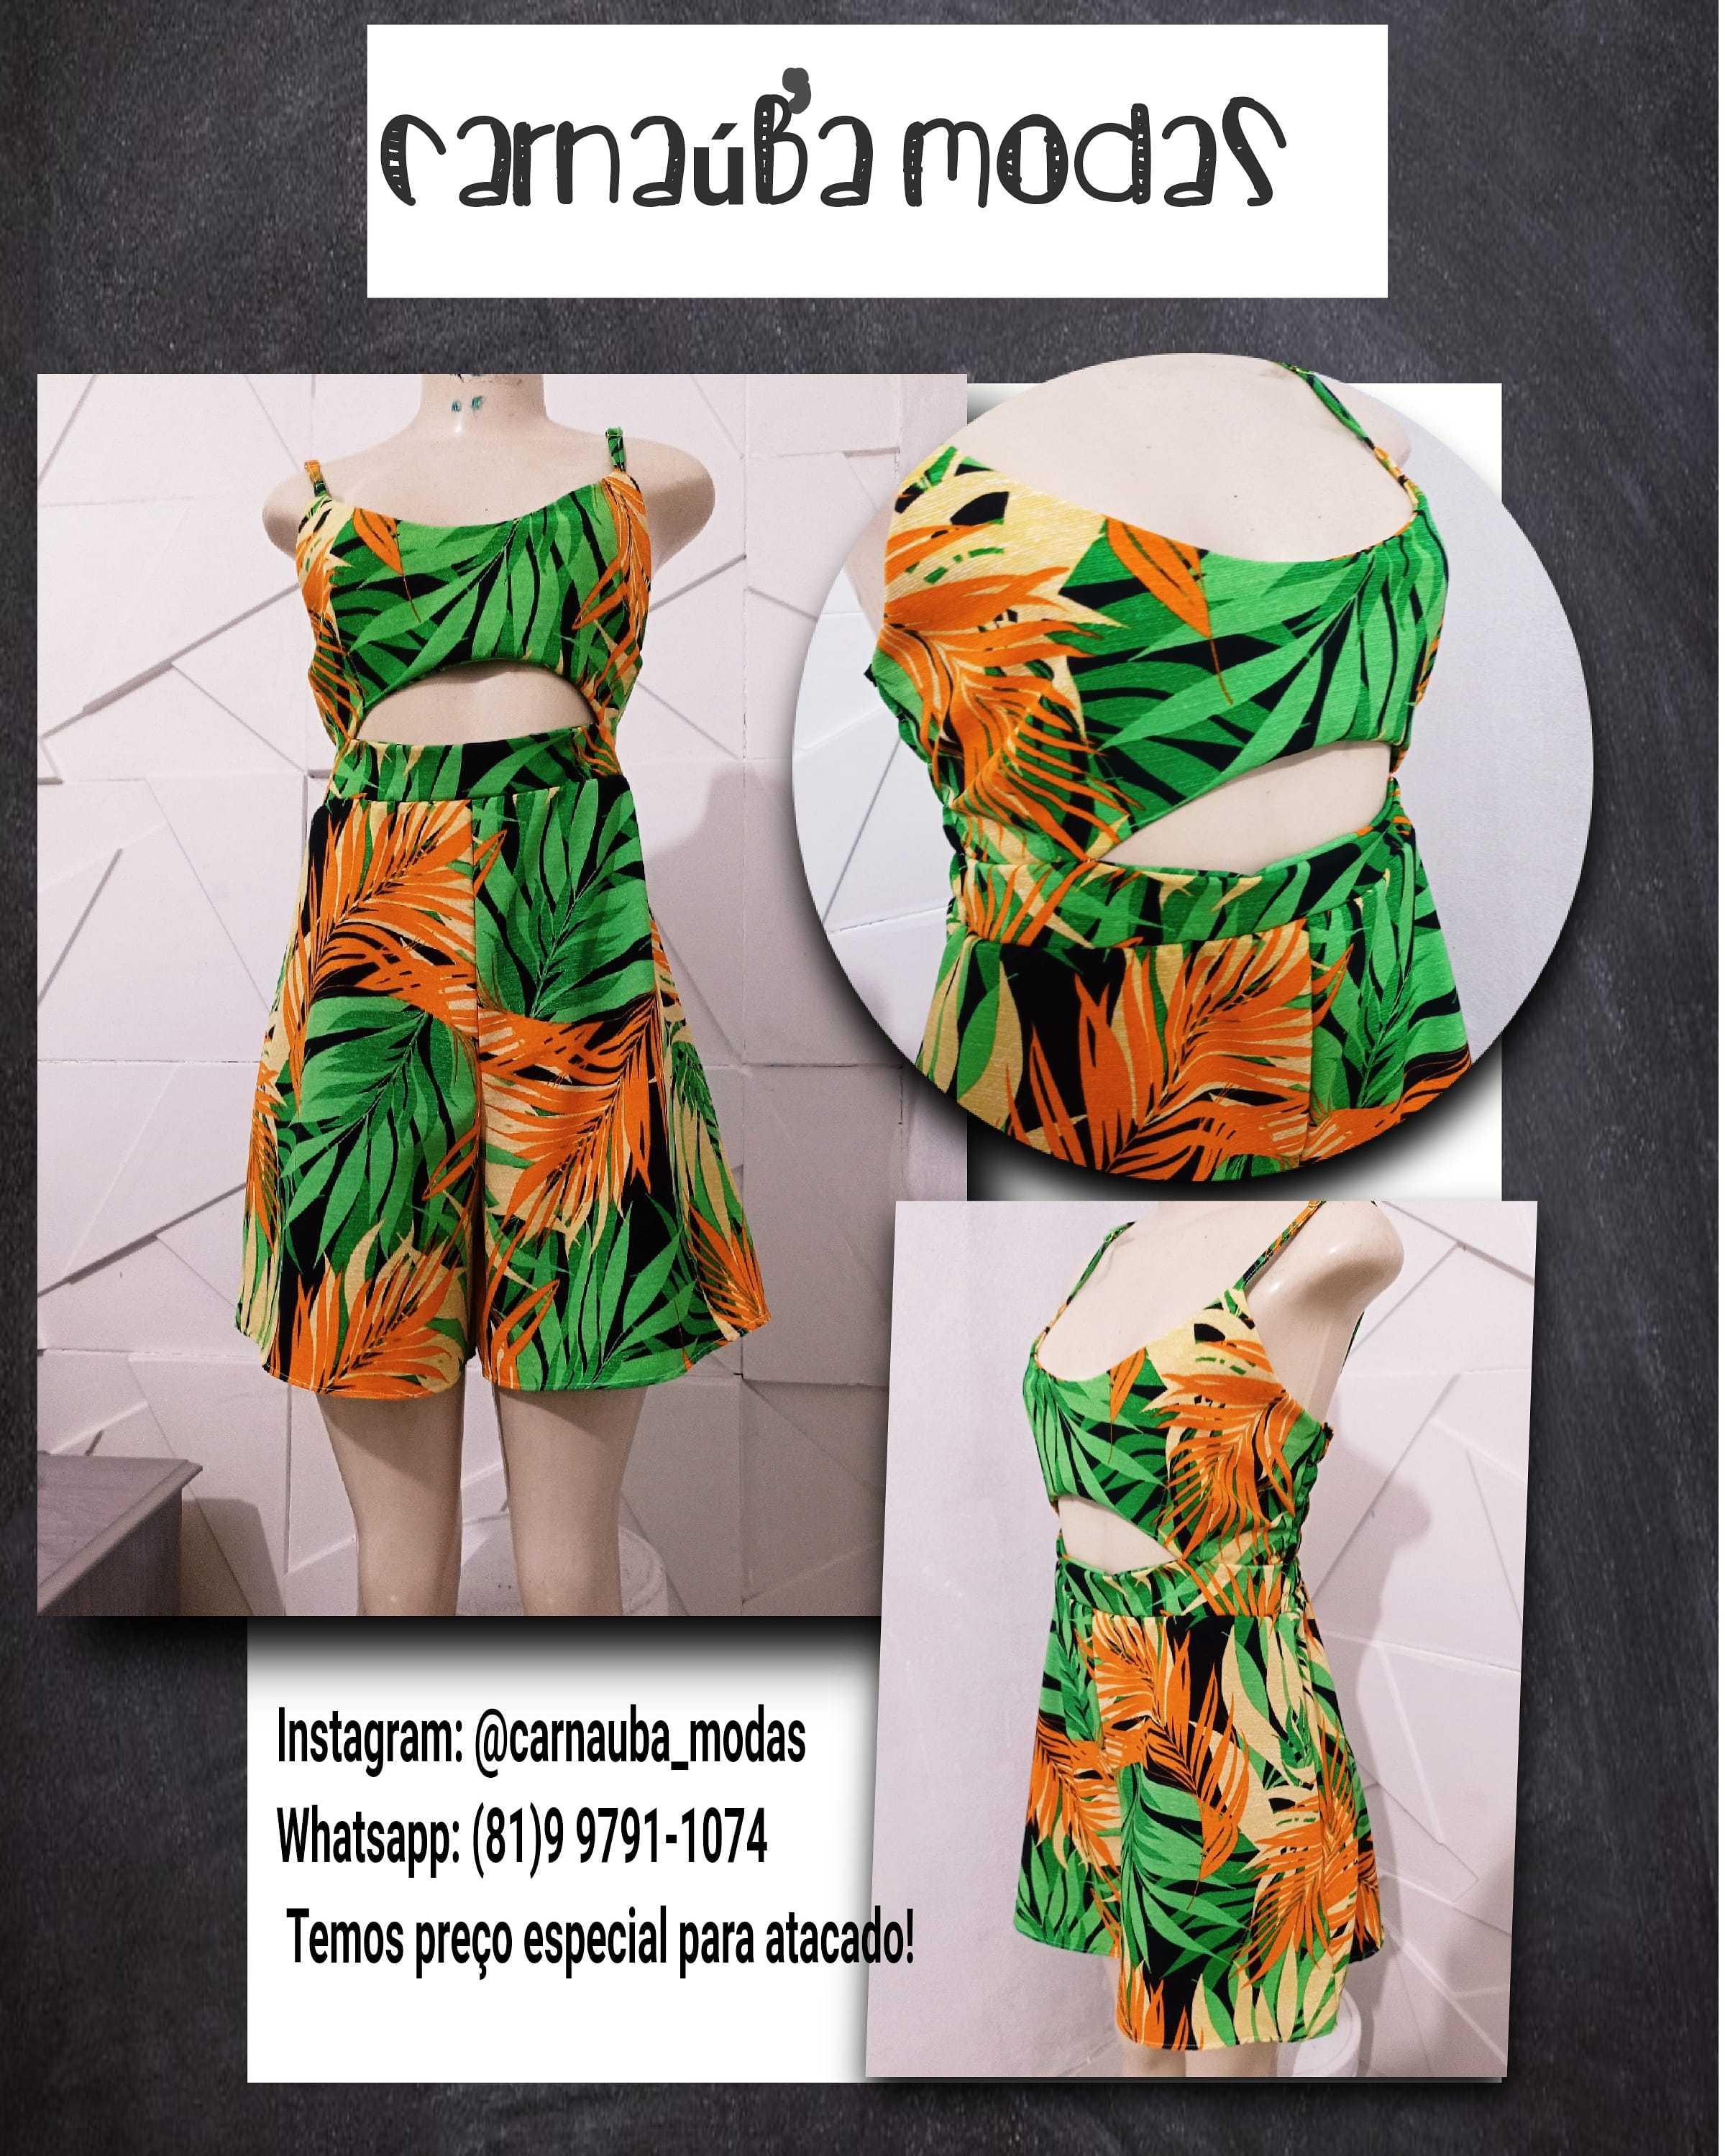 Carnaúba modas